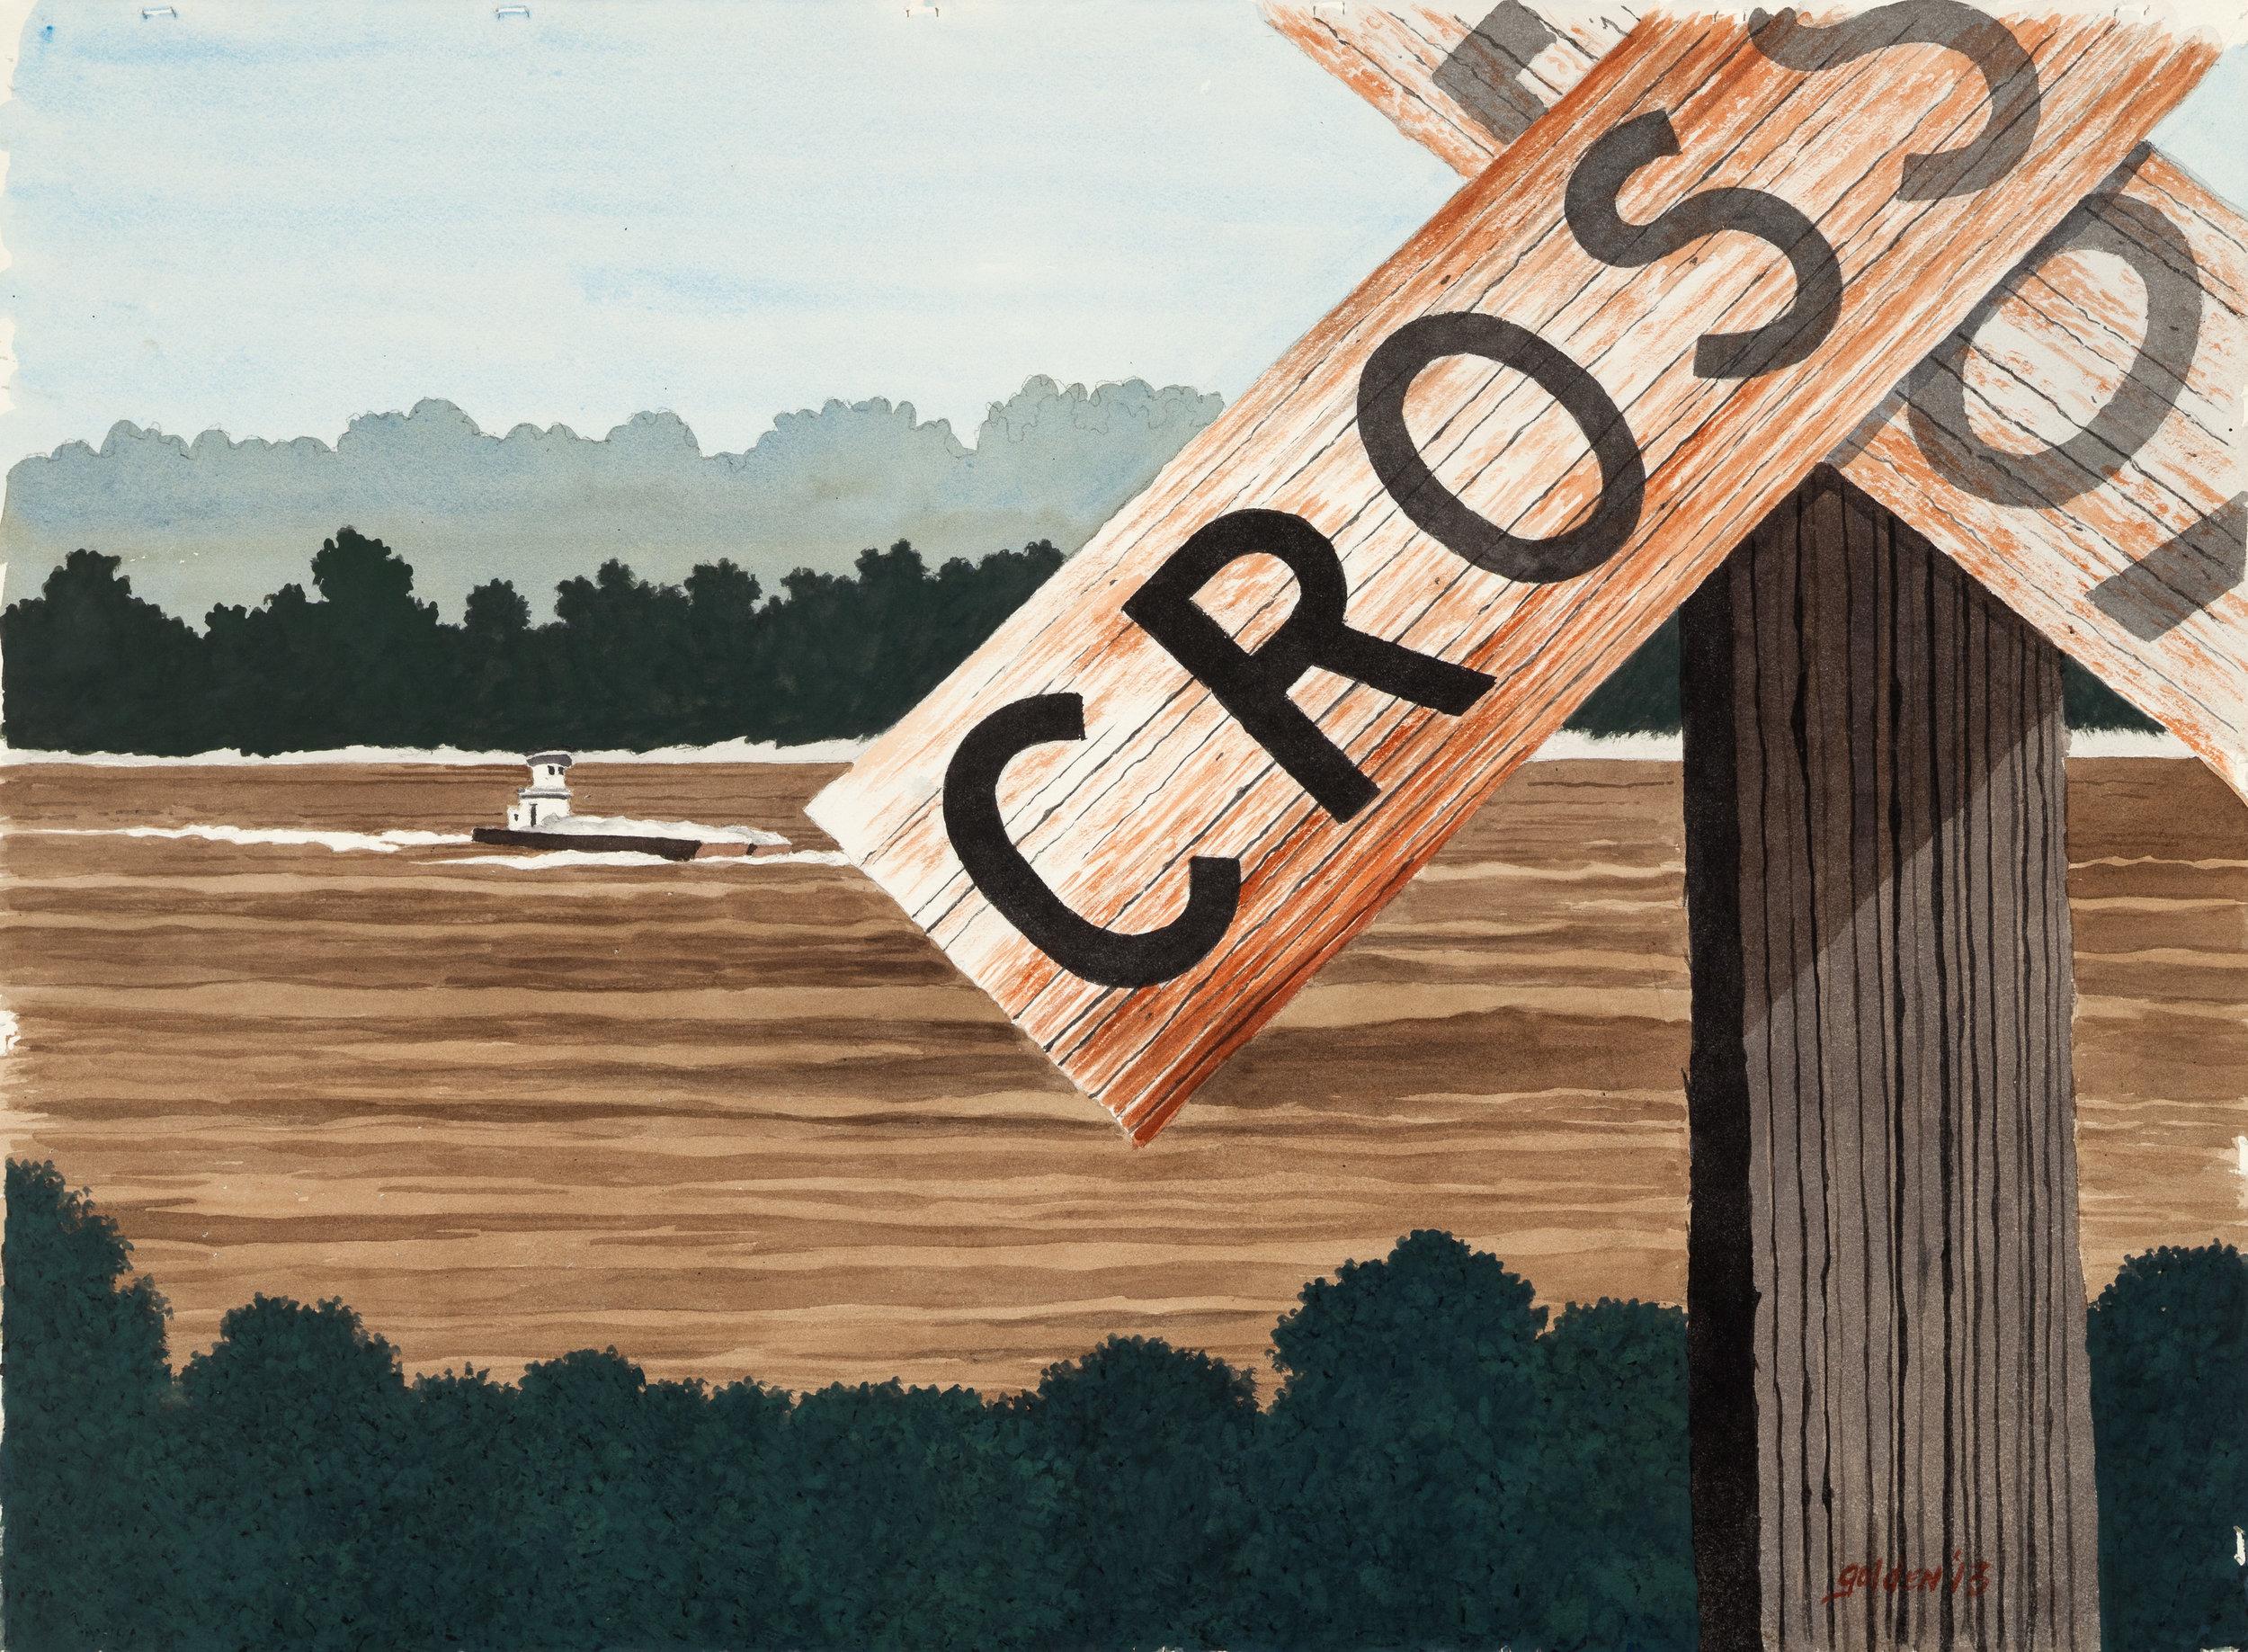 Muddy Crossing (2013)